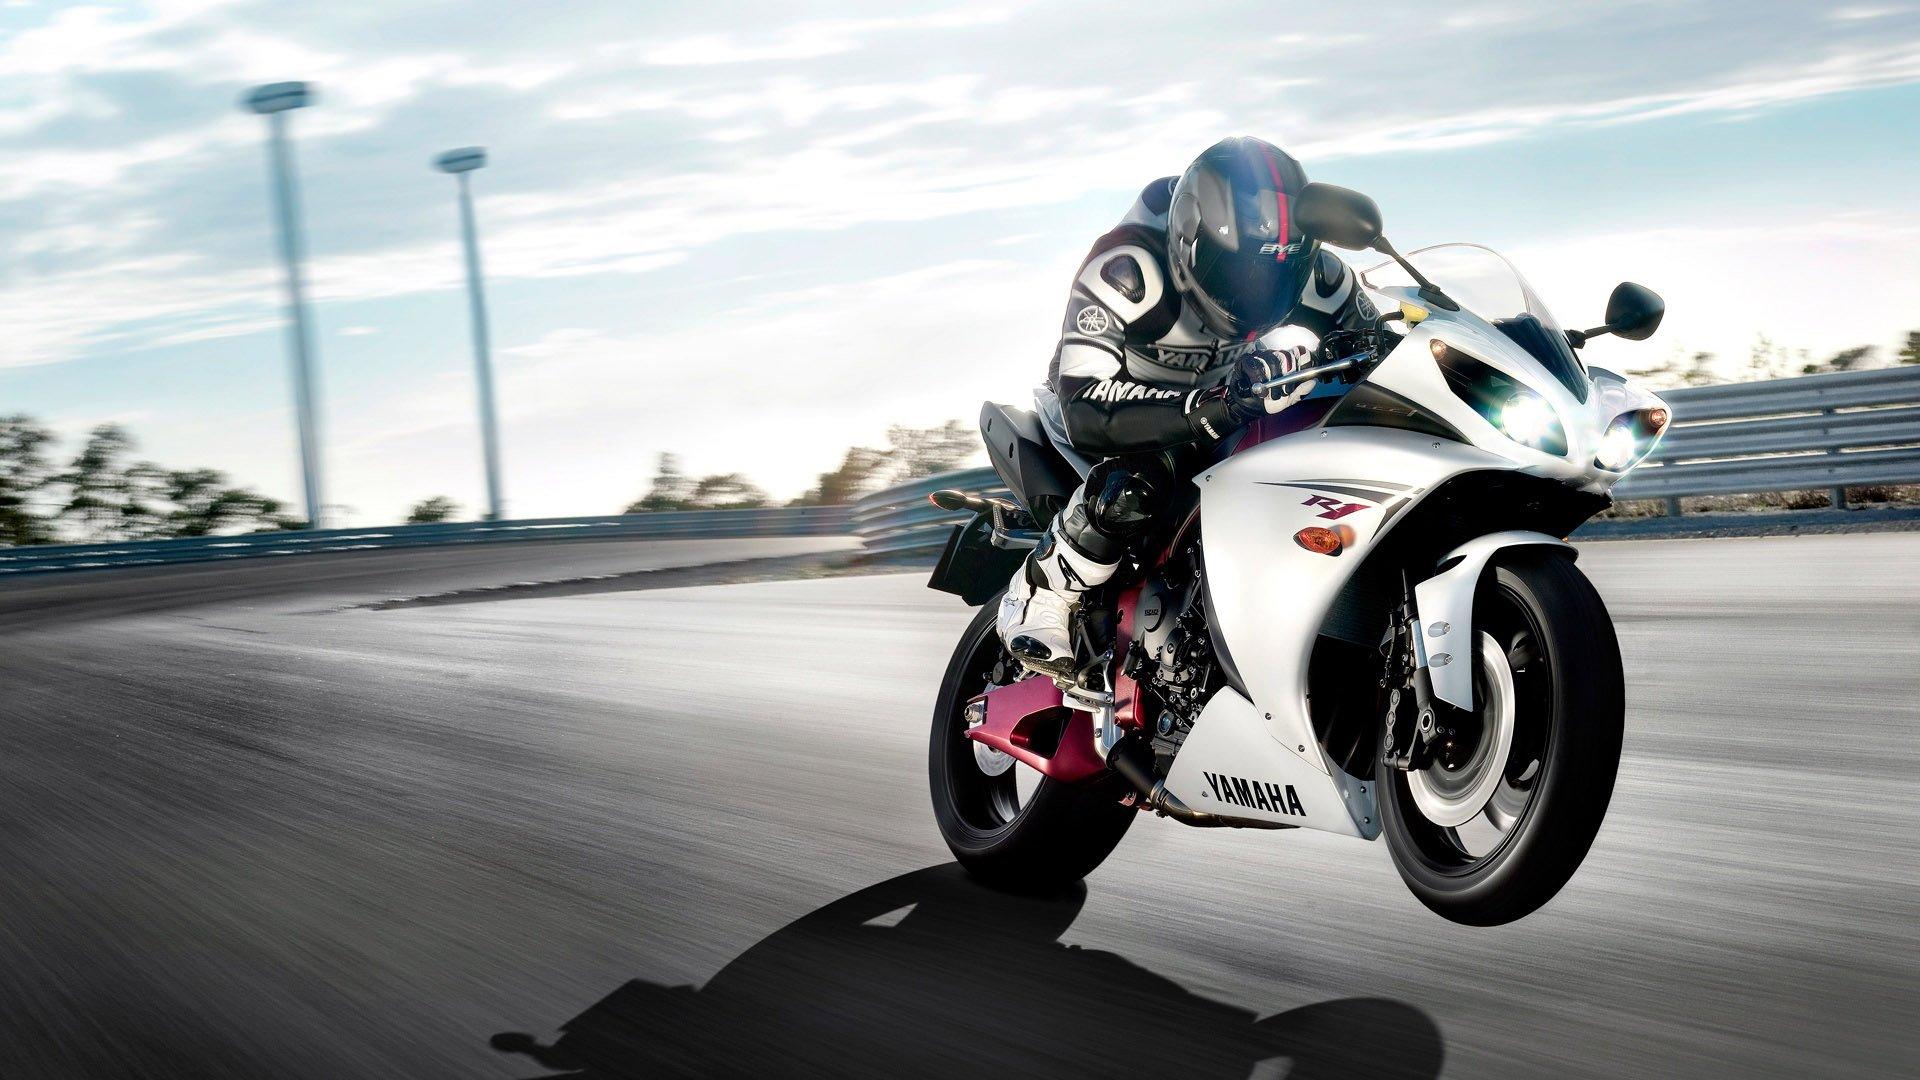 Motorcycle Hd Wallpapers  WallpaperSafari